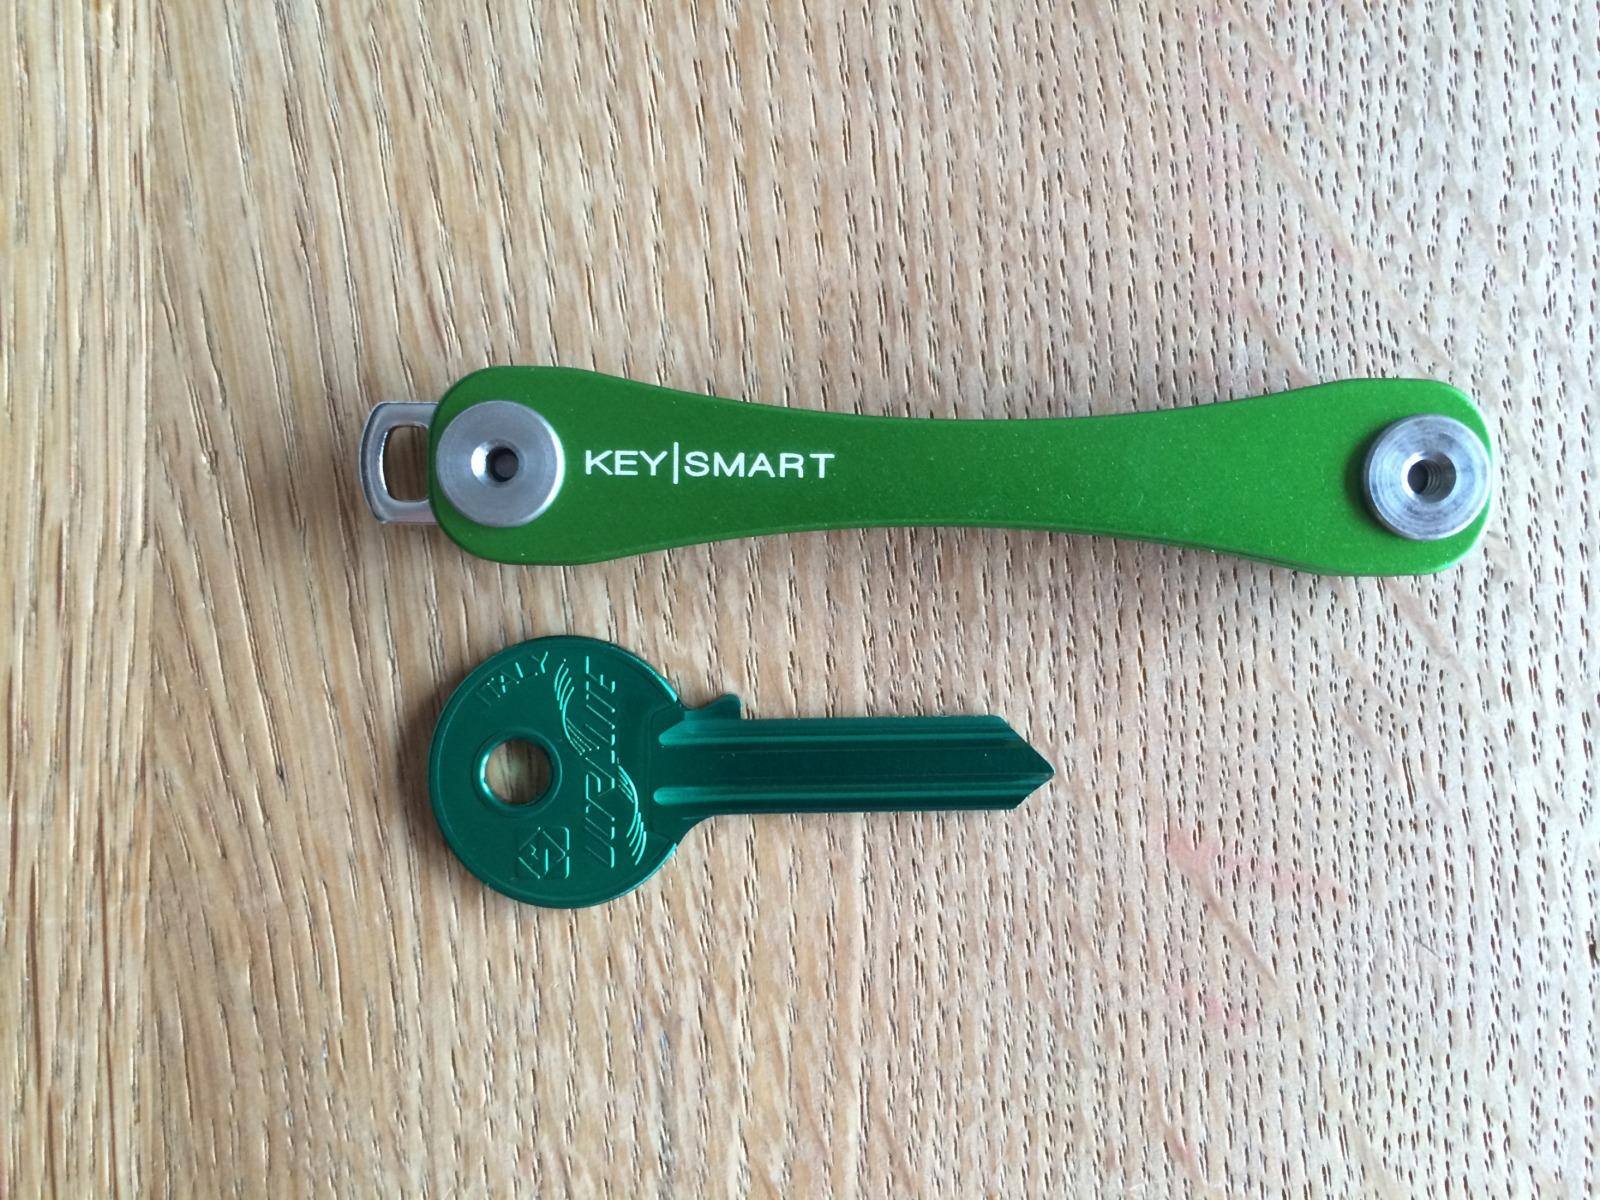 Ultralite-Ersatzschluessel fuer den Keysmart